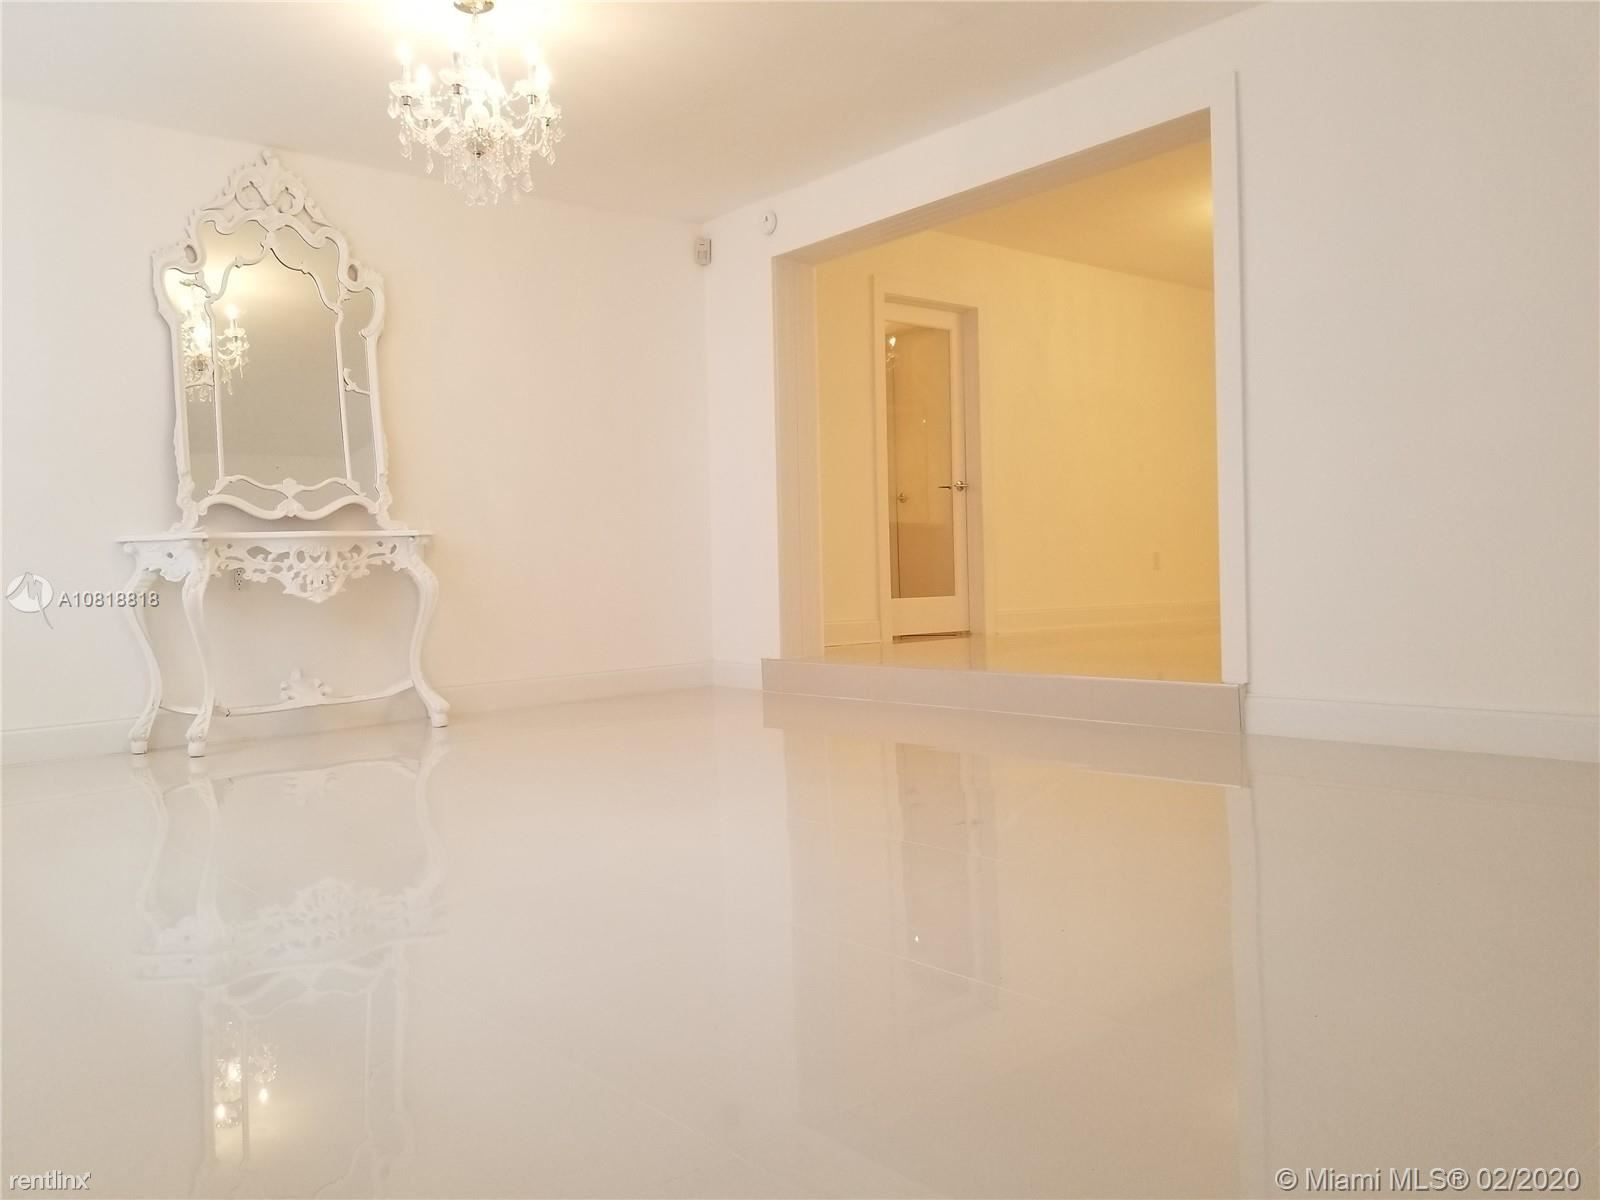 1121 Anastasia Ave, Coral Gables, FL - $5,000